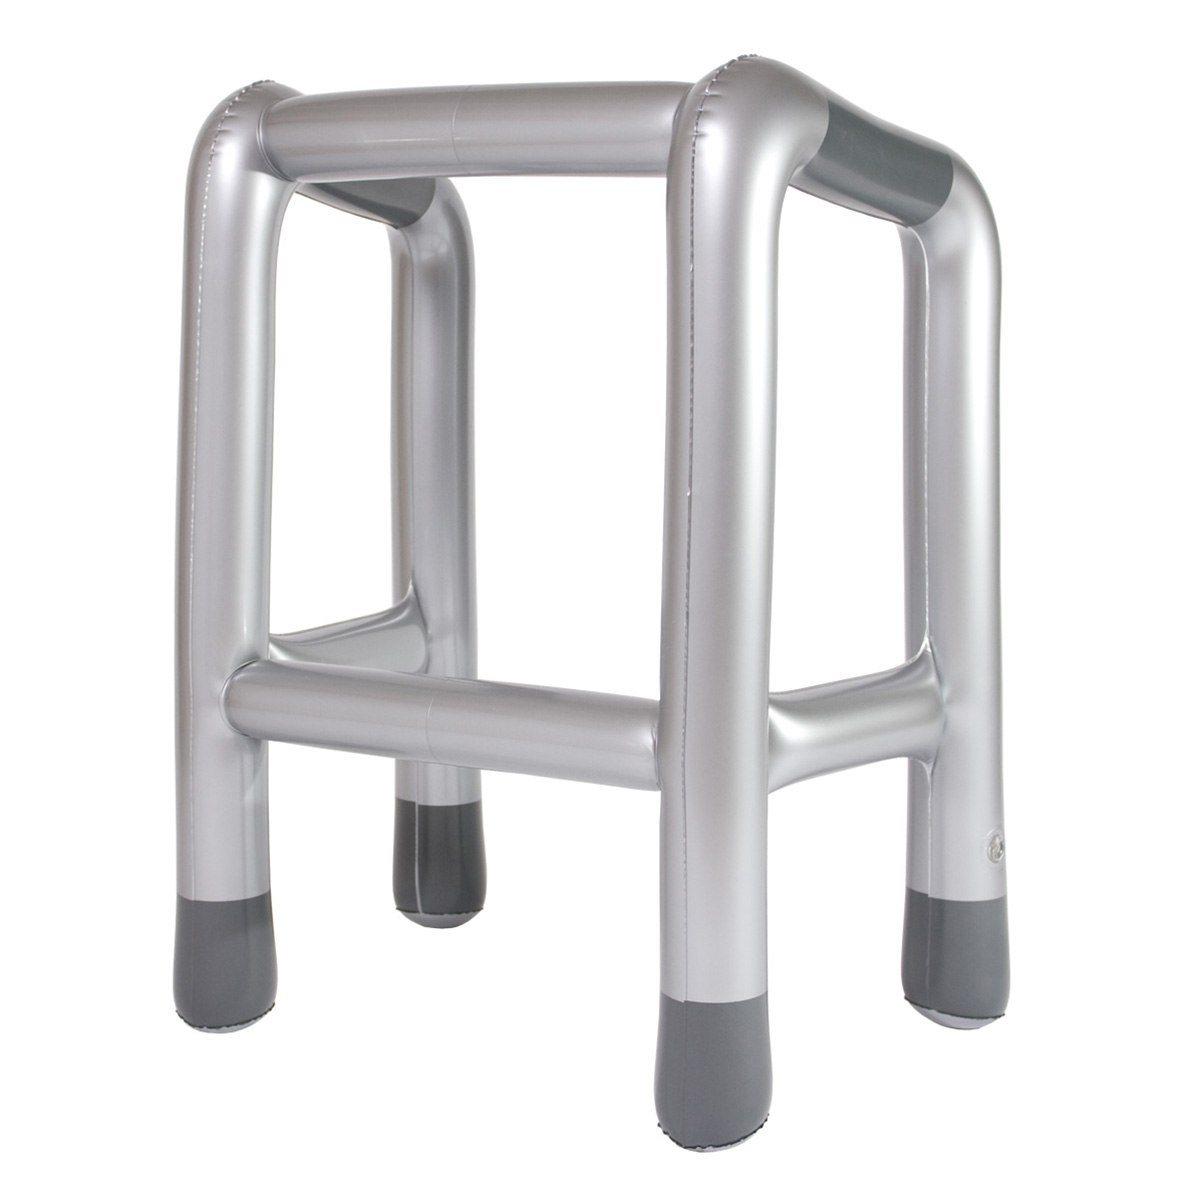 Uppblåsbar gåstol